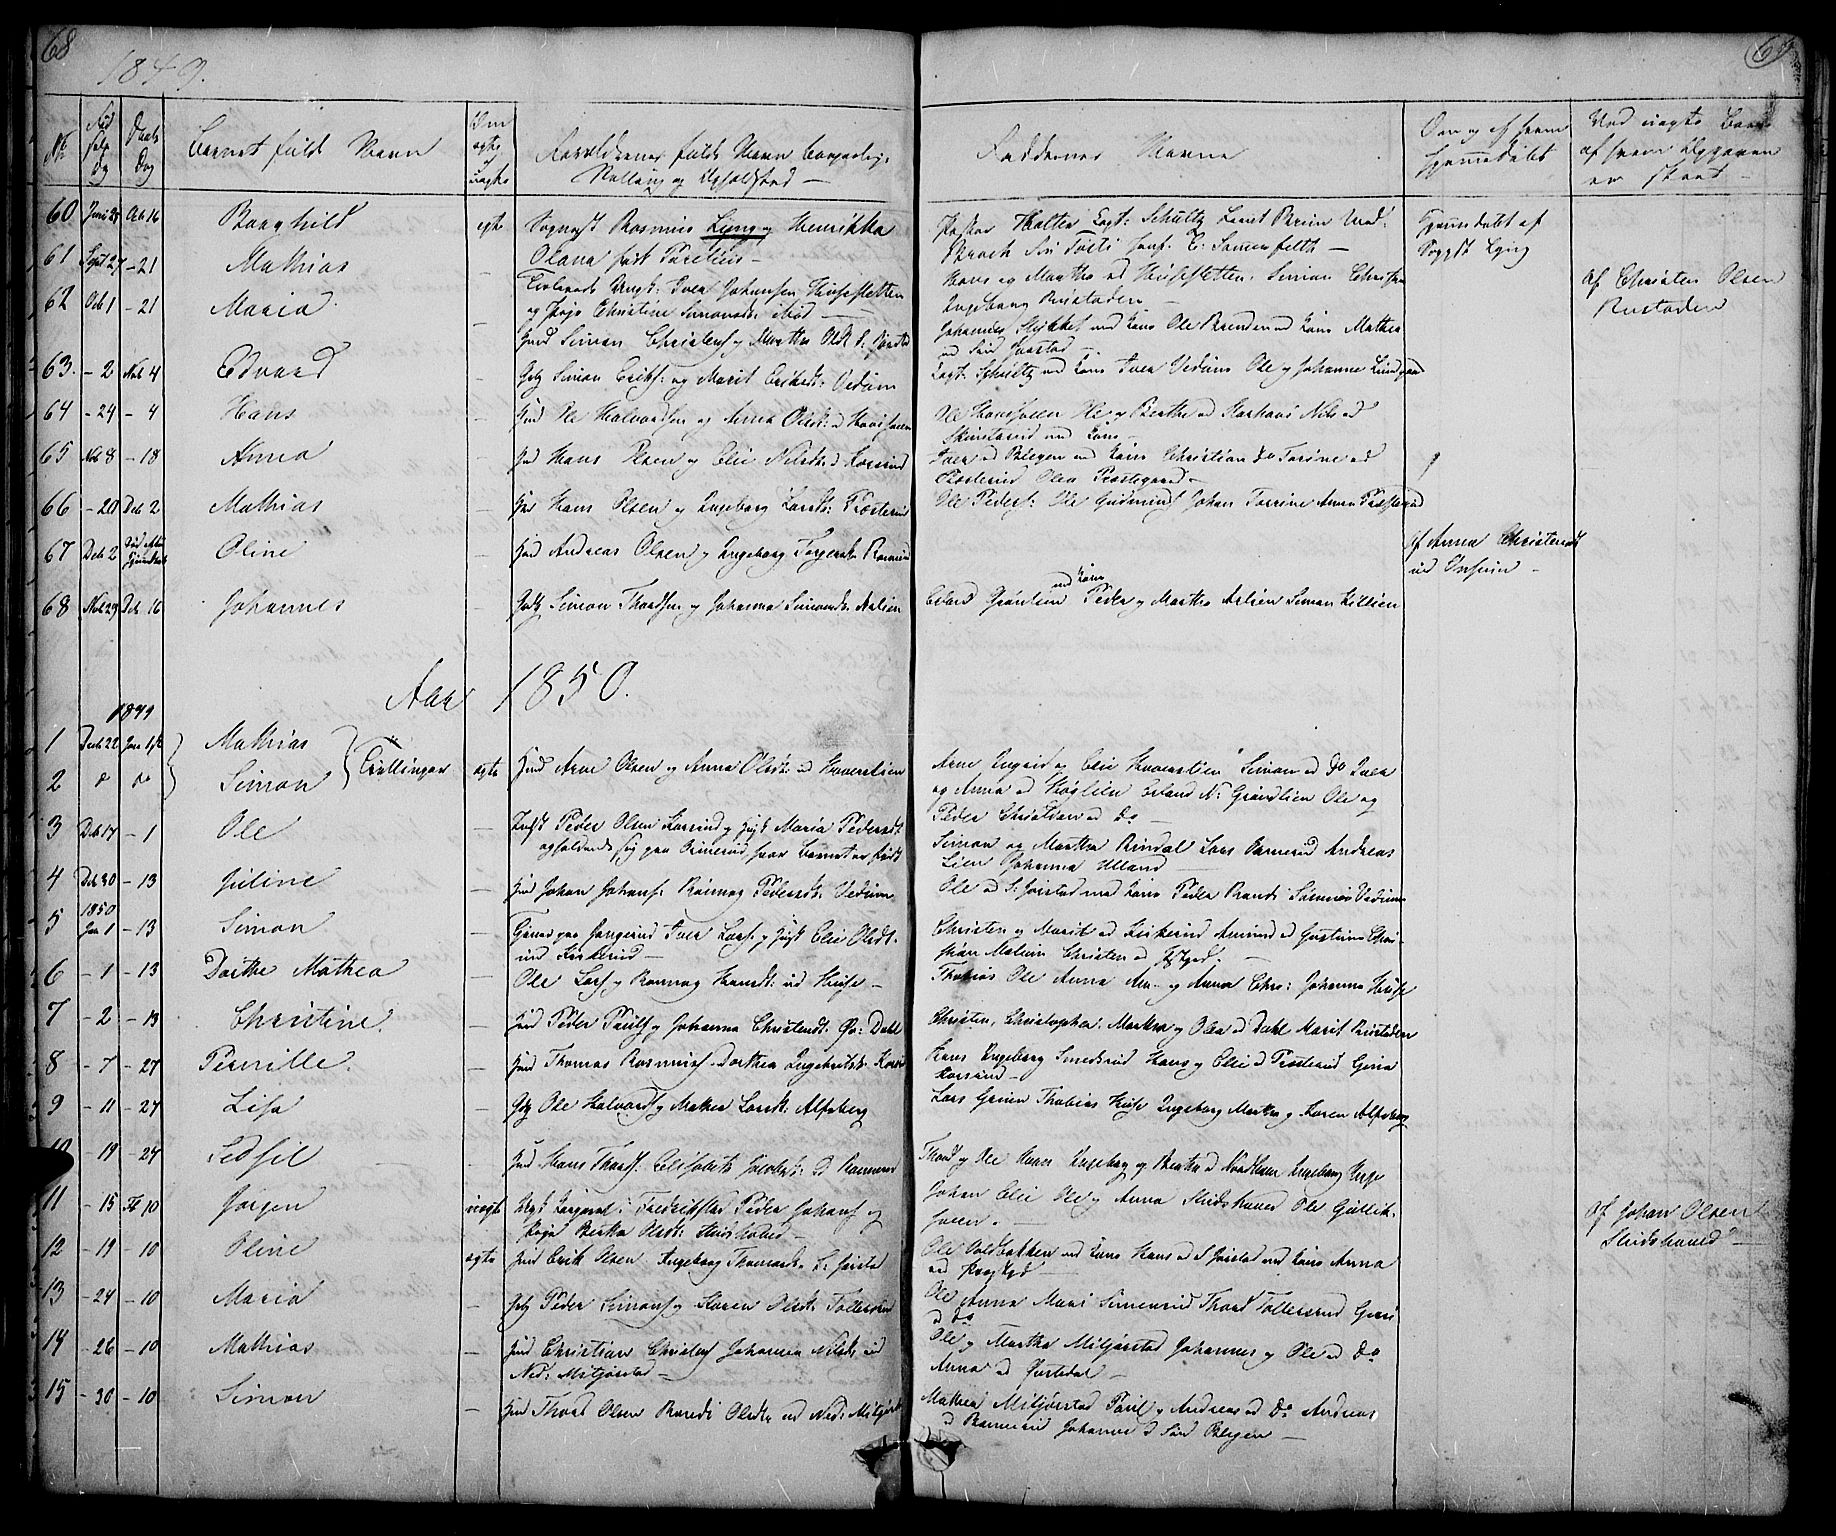 SAH, Fåberg prestekontor, Klokkerbok nr. 5, 1837-1864, s. 68-69